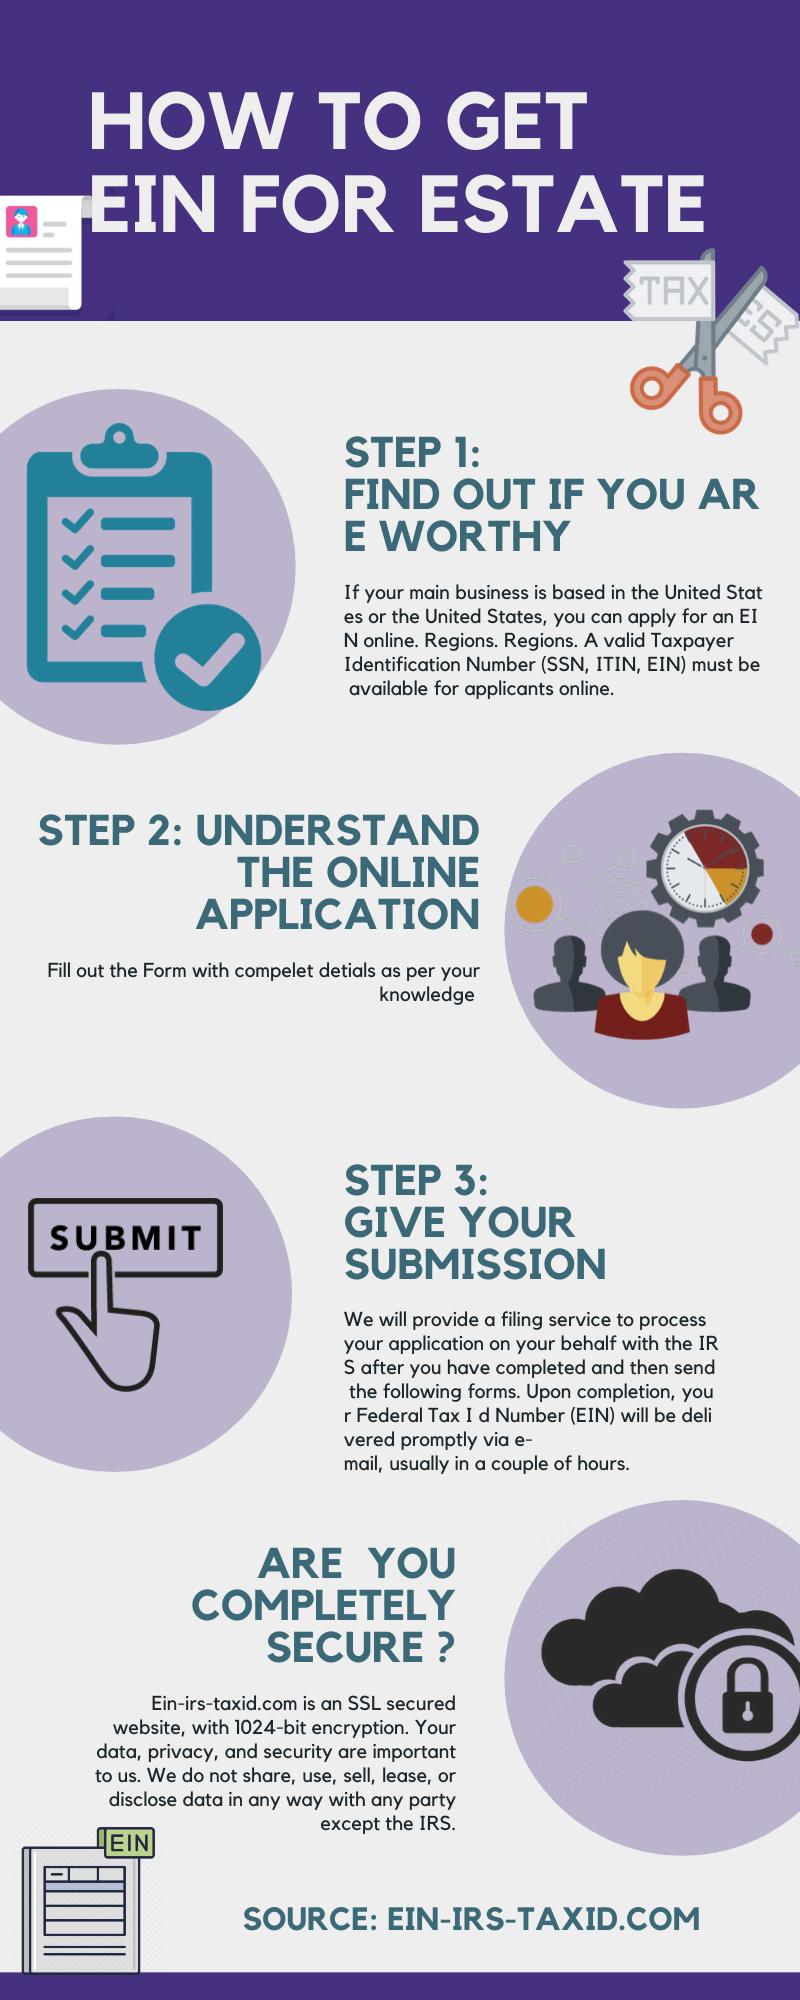 9c35c2c5cce66ab4122665ae2a2bbc3b - How To Get A Tax Id Number Online Free